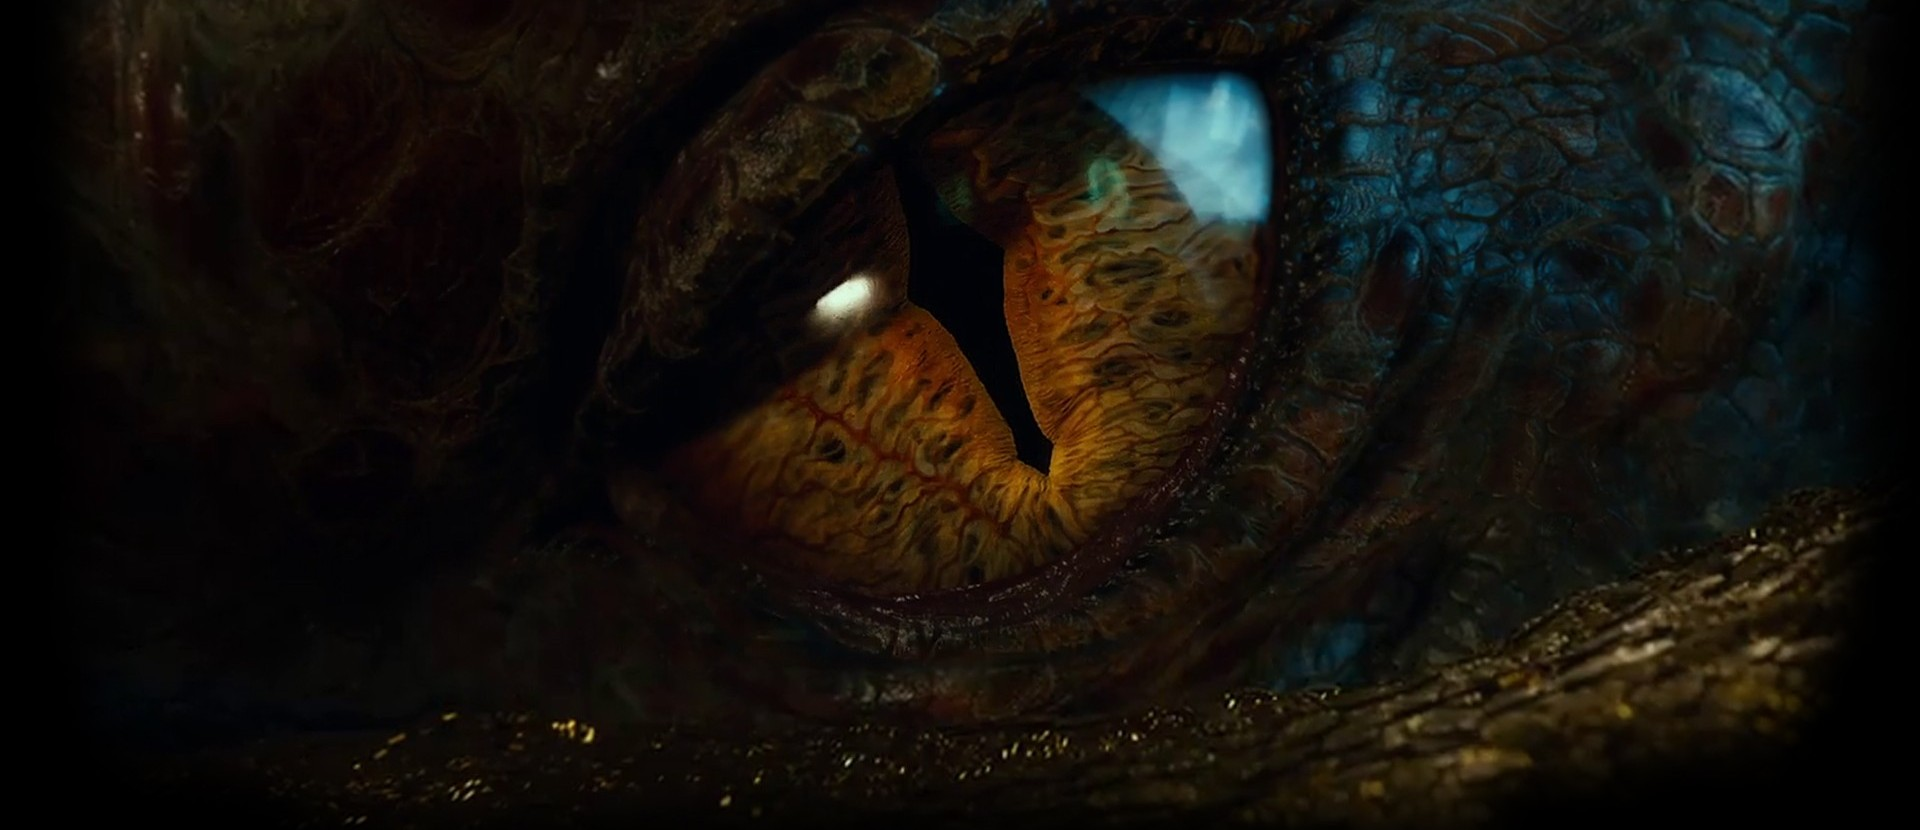 Filmfrelst #132: Hobbiten: Smaugs ødemark